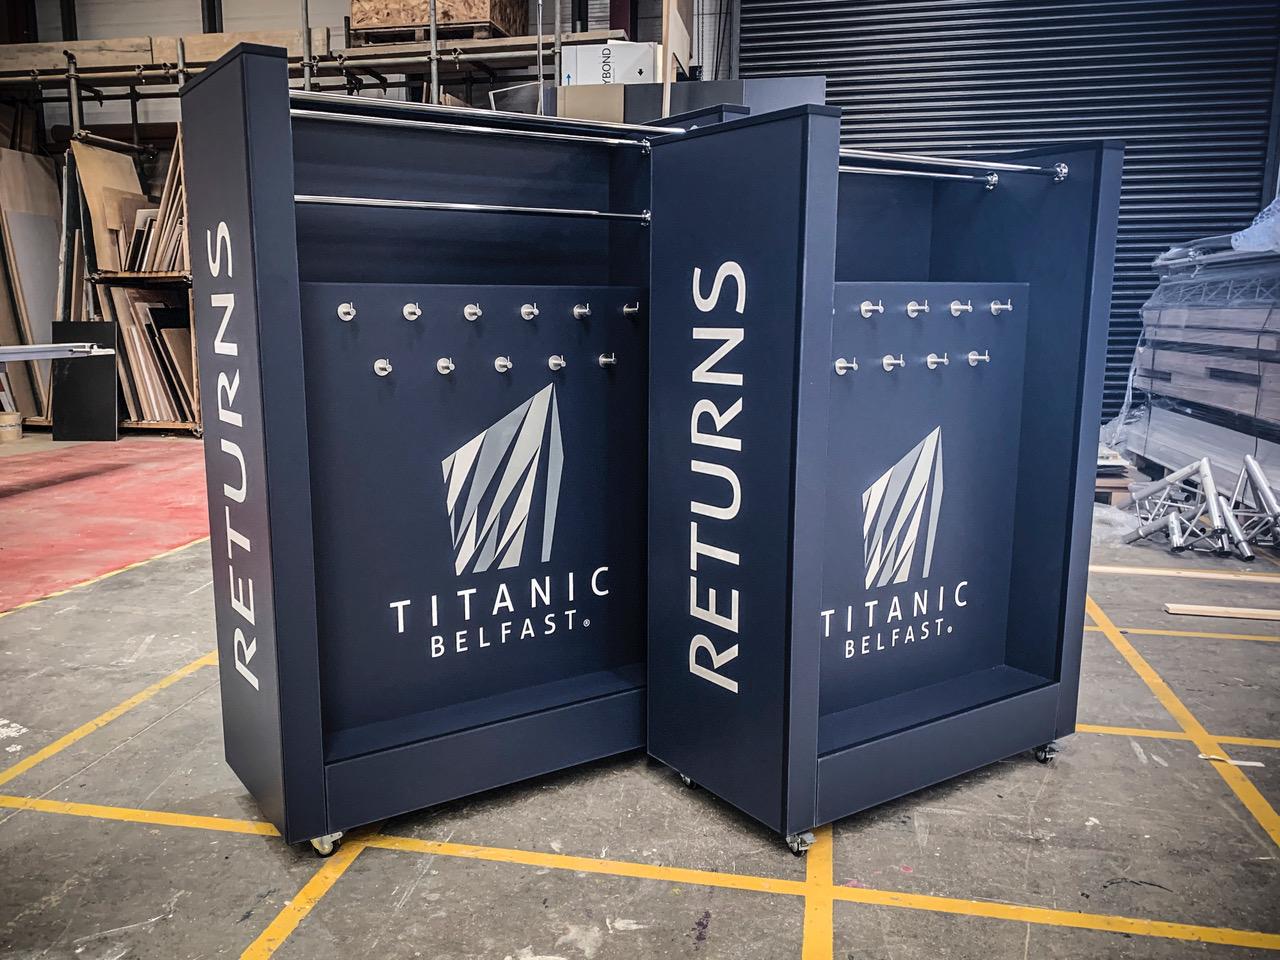 Titanic Belfast AV Units headline image